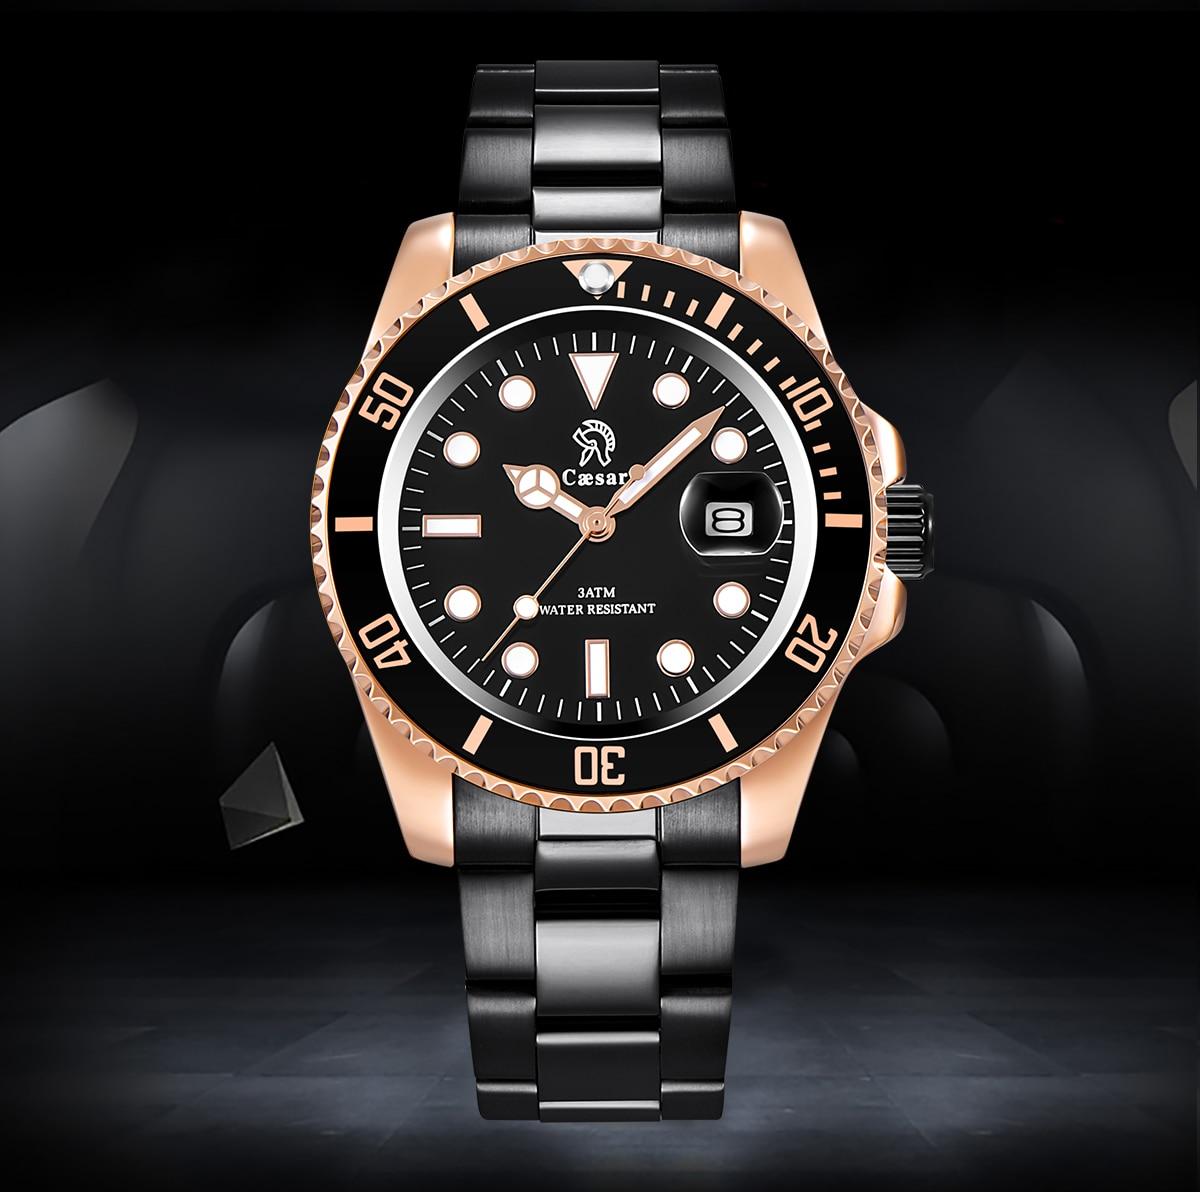 Ha6fe80c041bc4afa9ef2662874a0bd8a9 Rose Gold caesar  Top Brand Luxury Watches